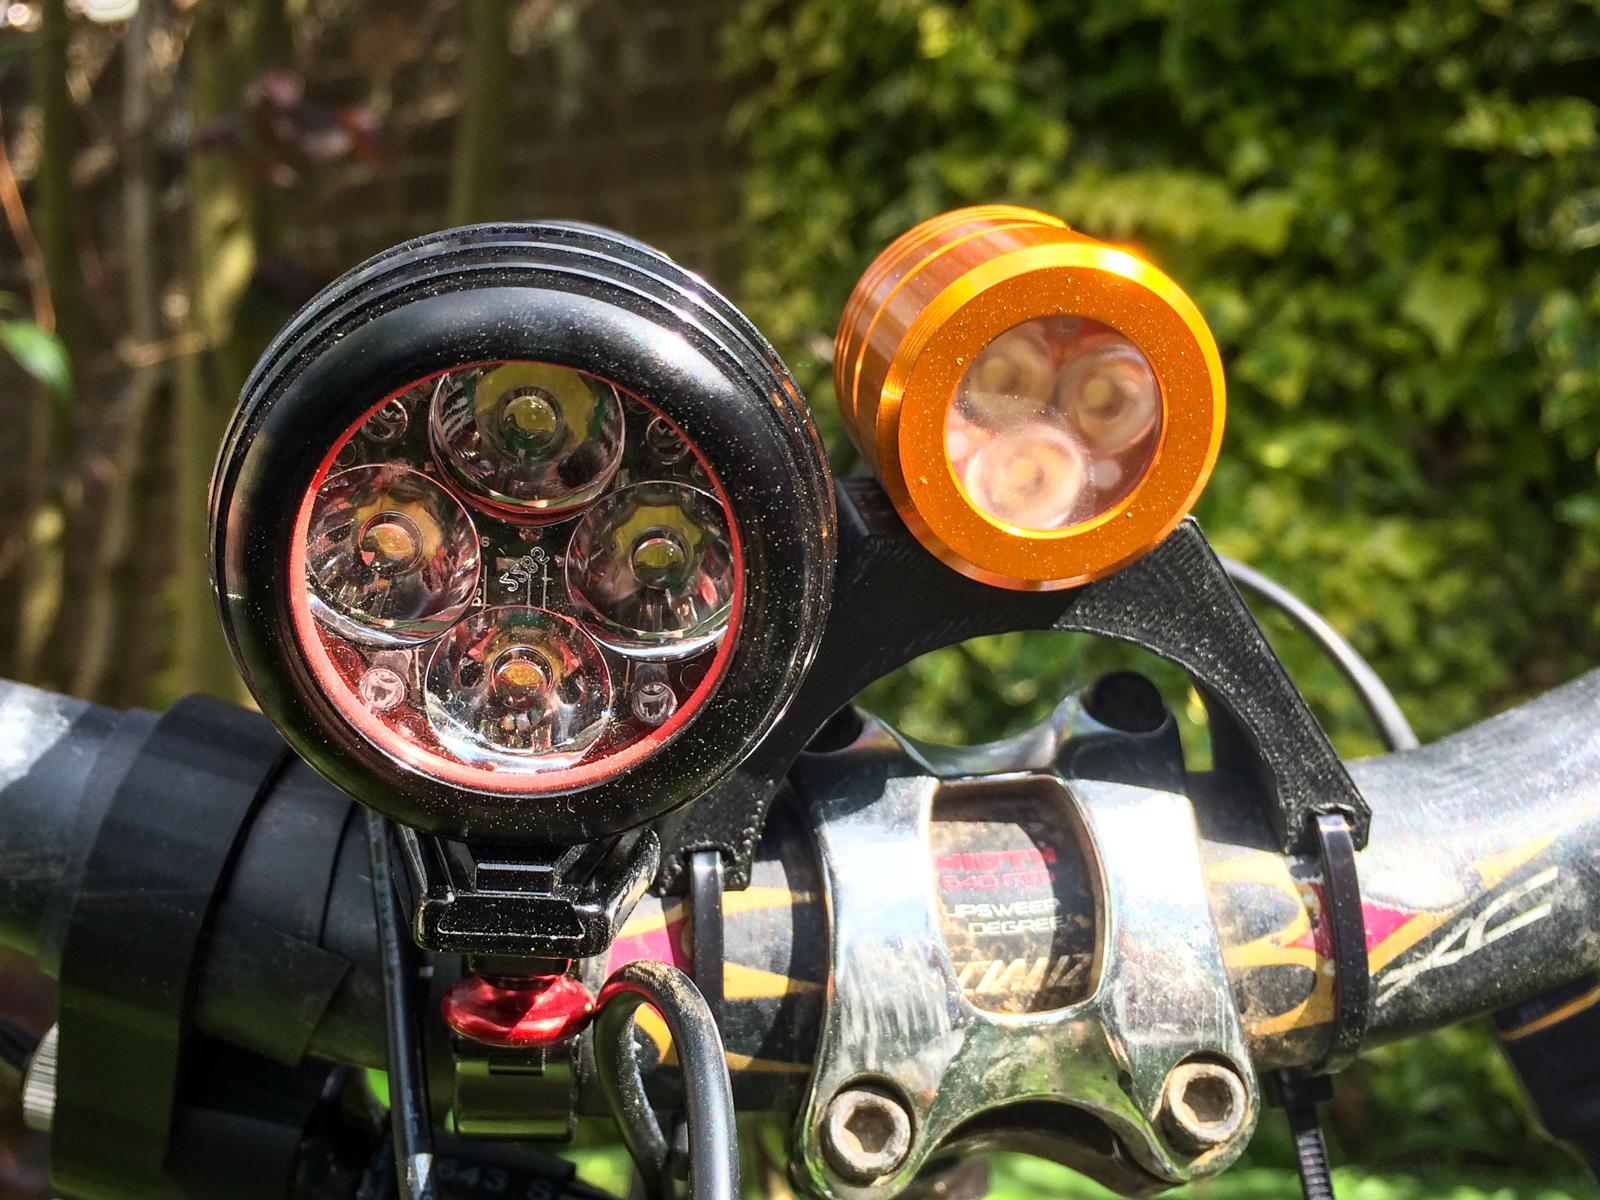 Bikepacking Dynamo Lights: kLite vs Revo